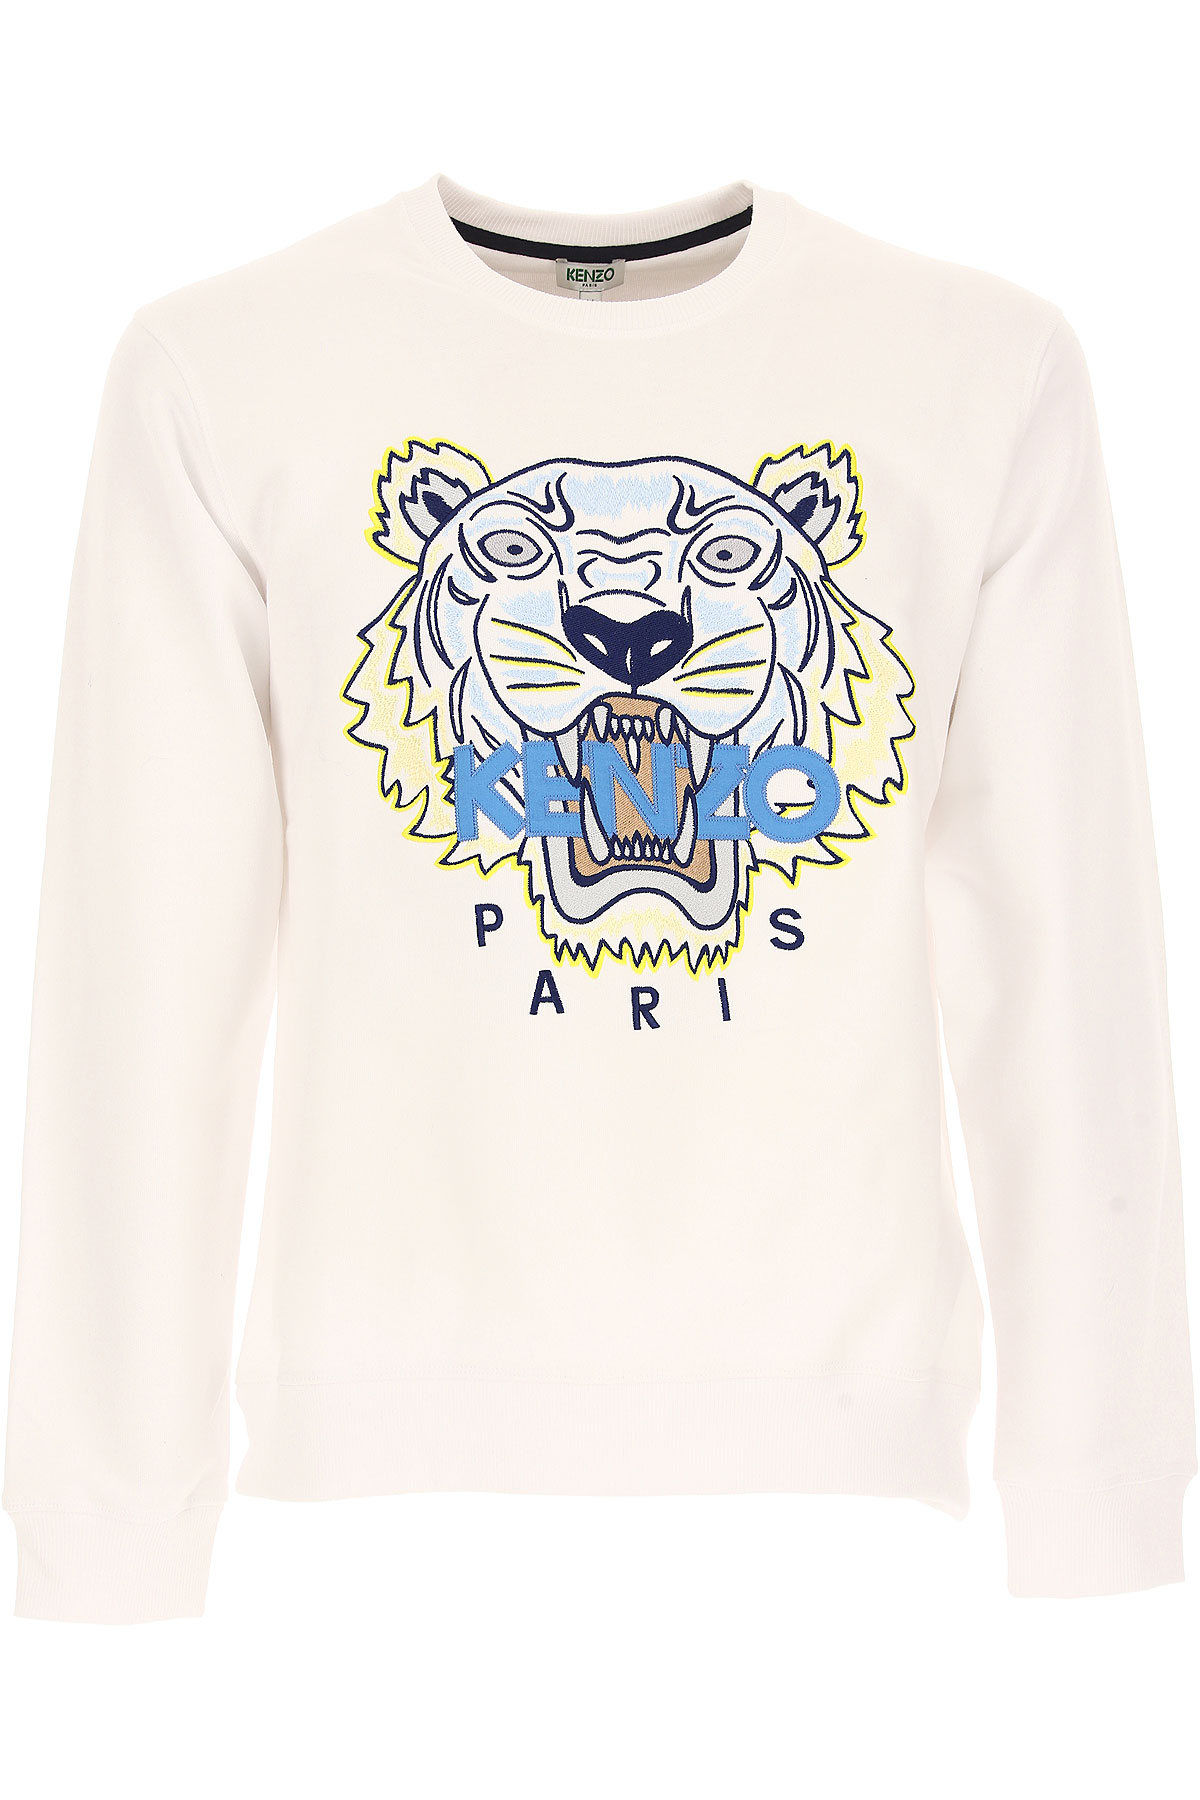 Kenzo Sweatshirt for Men, White, Cotton, 2017, L S XL XXL USA-438432